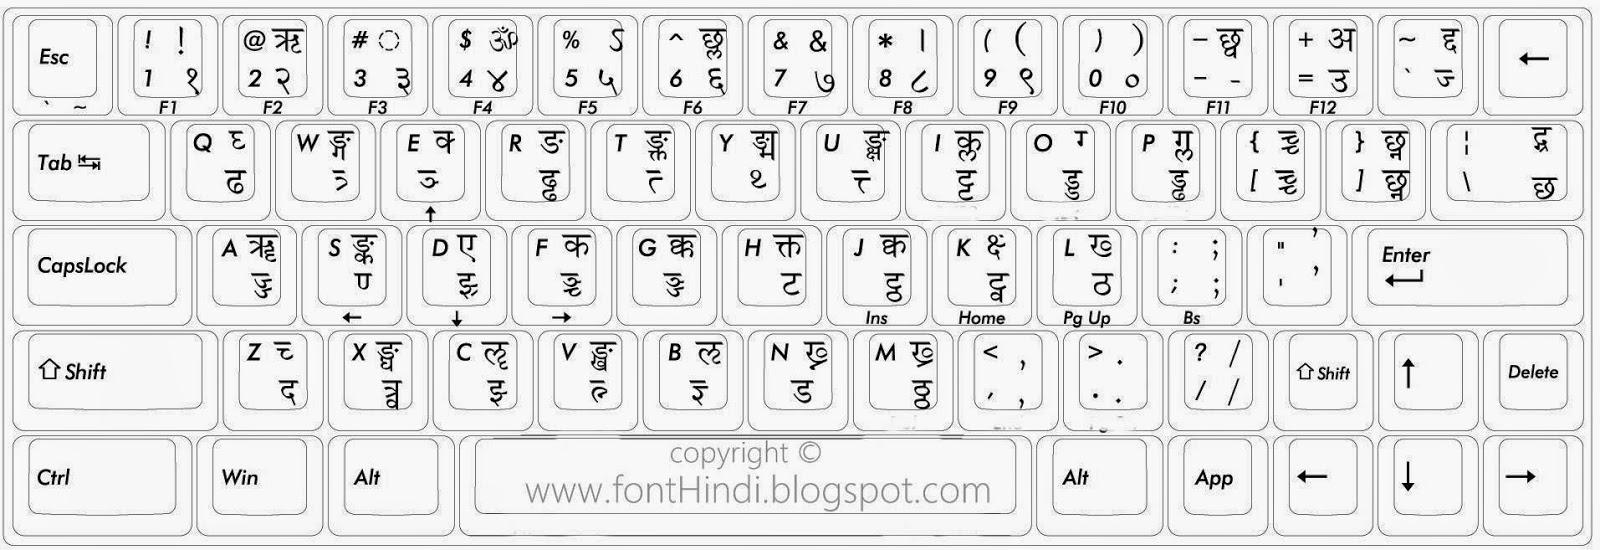 Akruti Font Keyboard - pastcreative